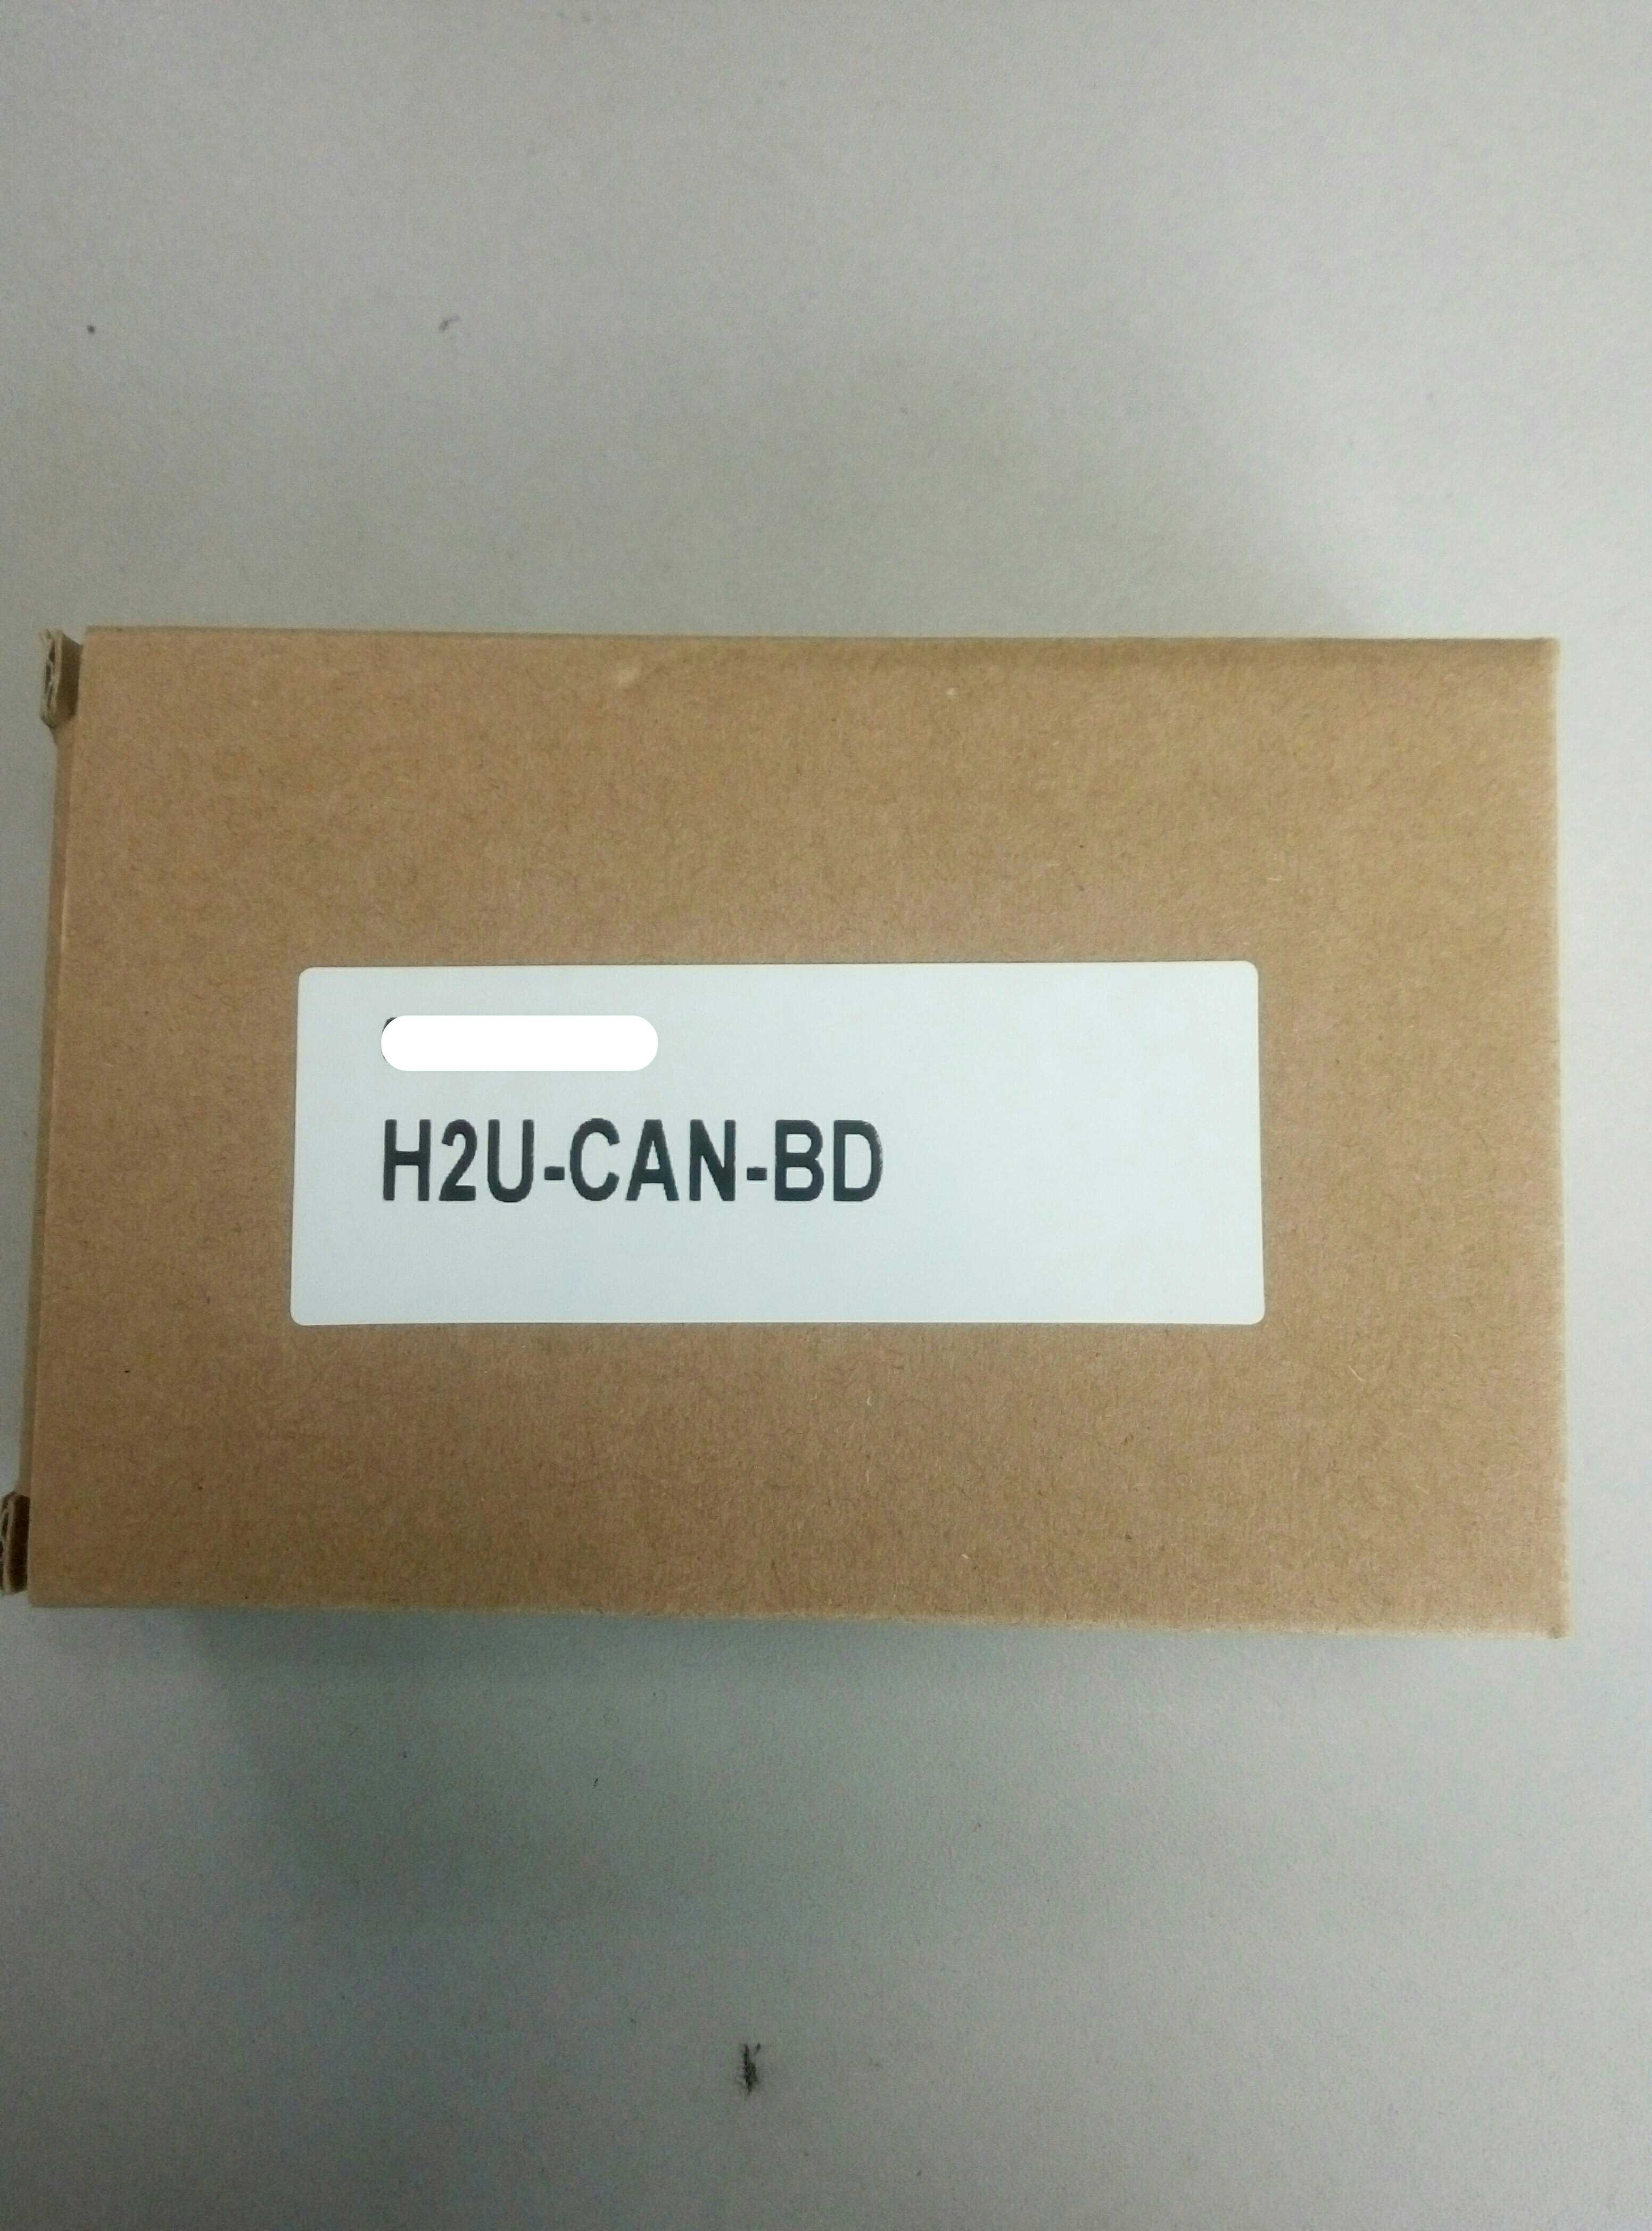 H2U-CAN-BD PLC H2U Series Bus Expansion Card